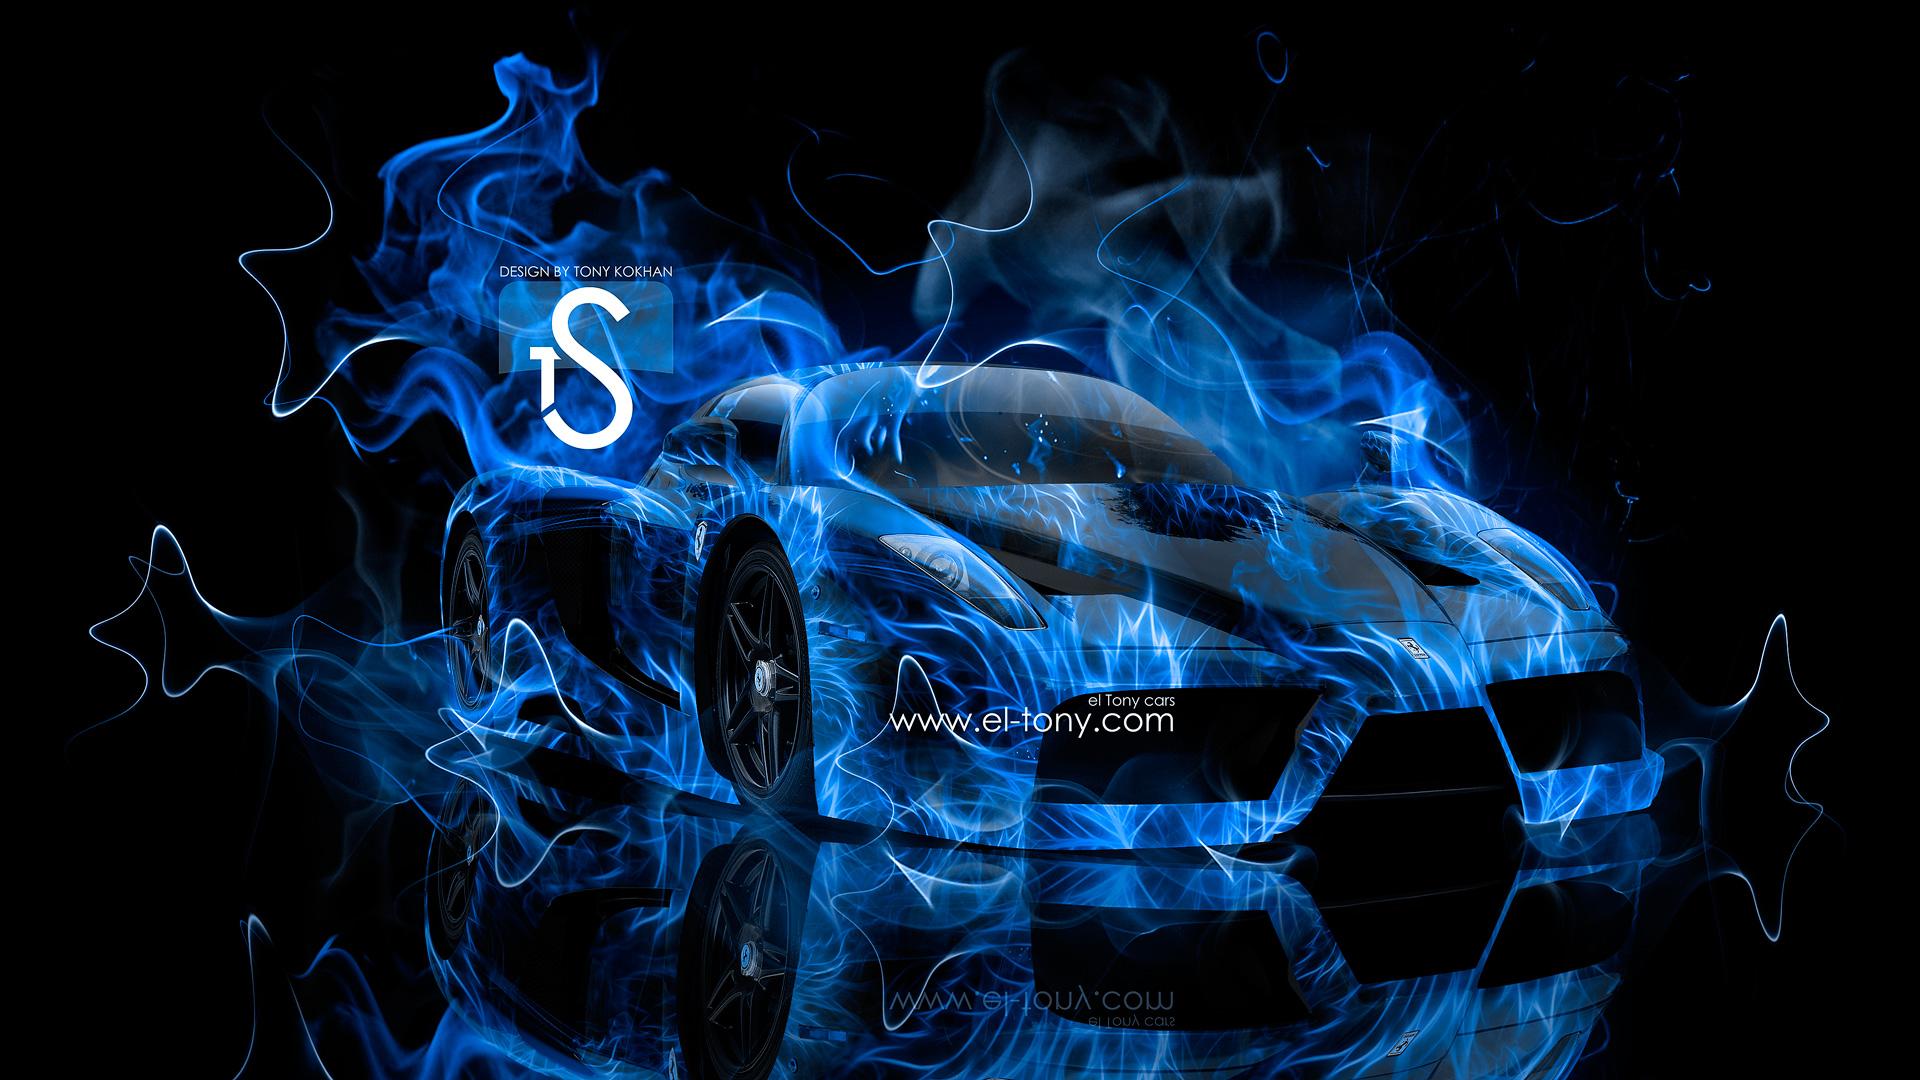 Blue Fire Wallpapers Desktop - Wickedsa com